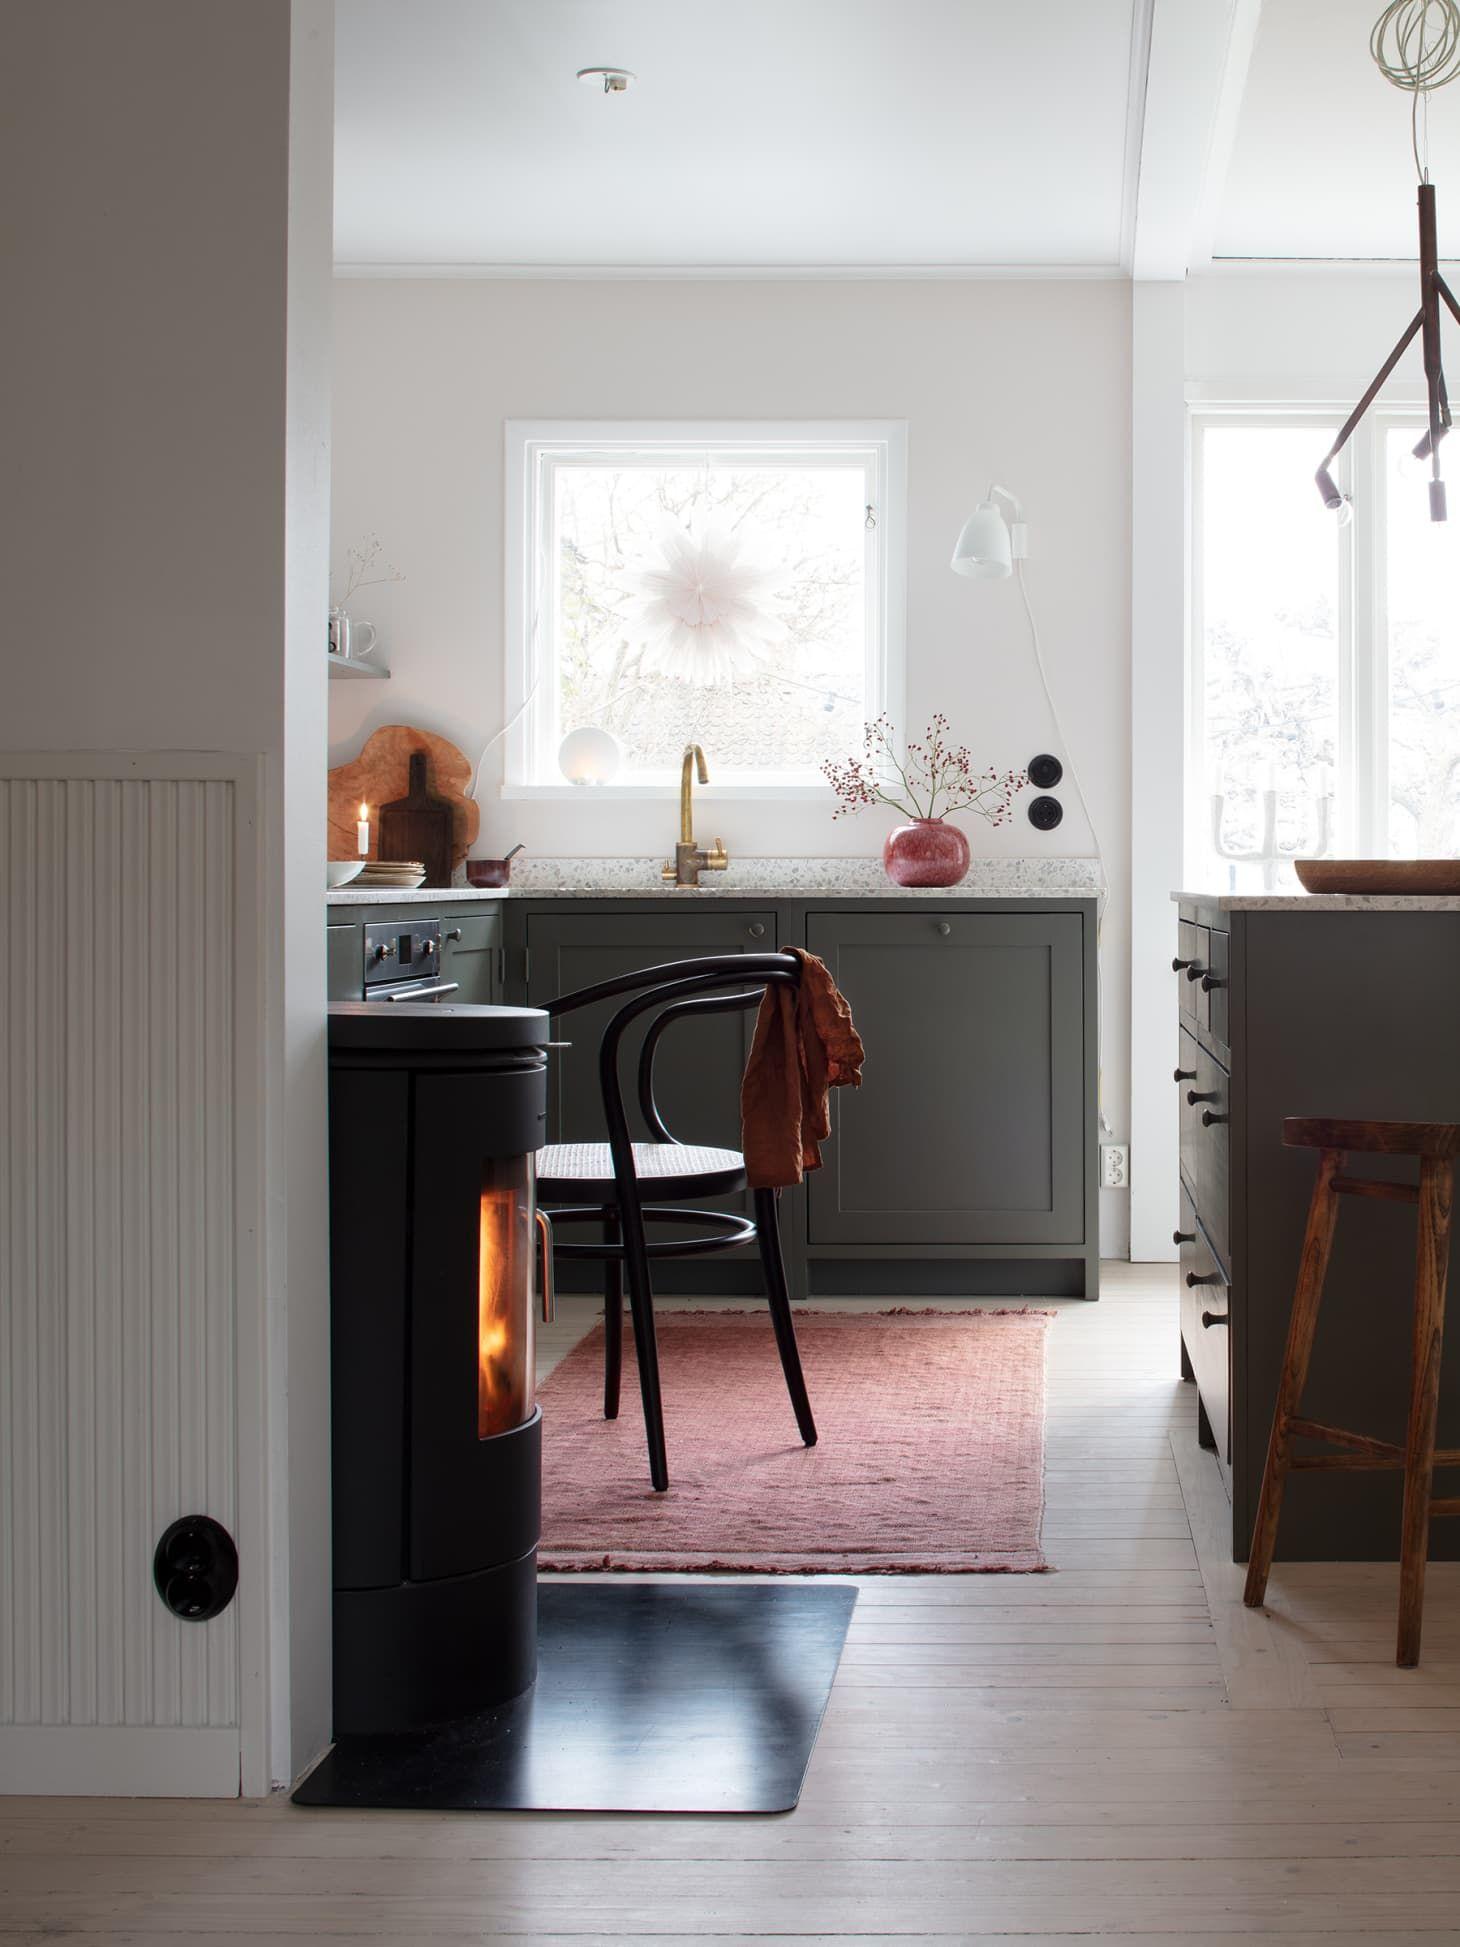 Every Inch Of This Swedish Home Is Full Of Scandinavian Design Inspiration My Scandinavian Home,Wooden Door Design For Home India